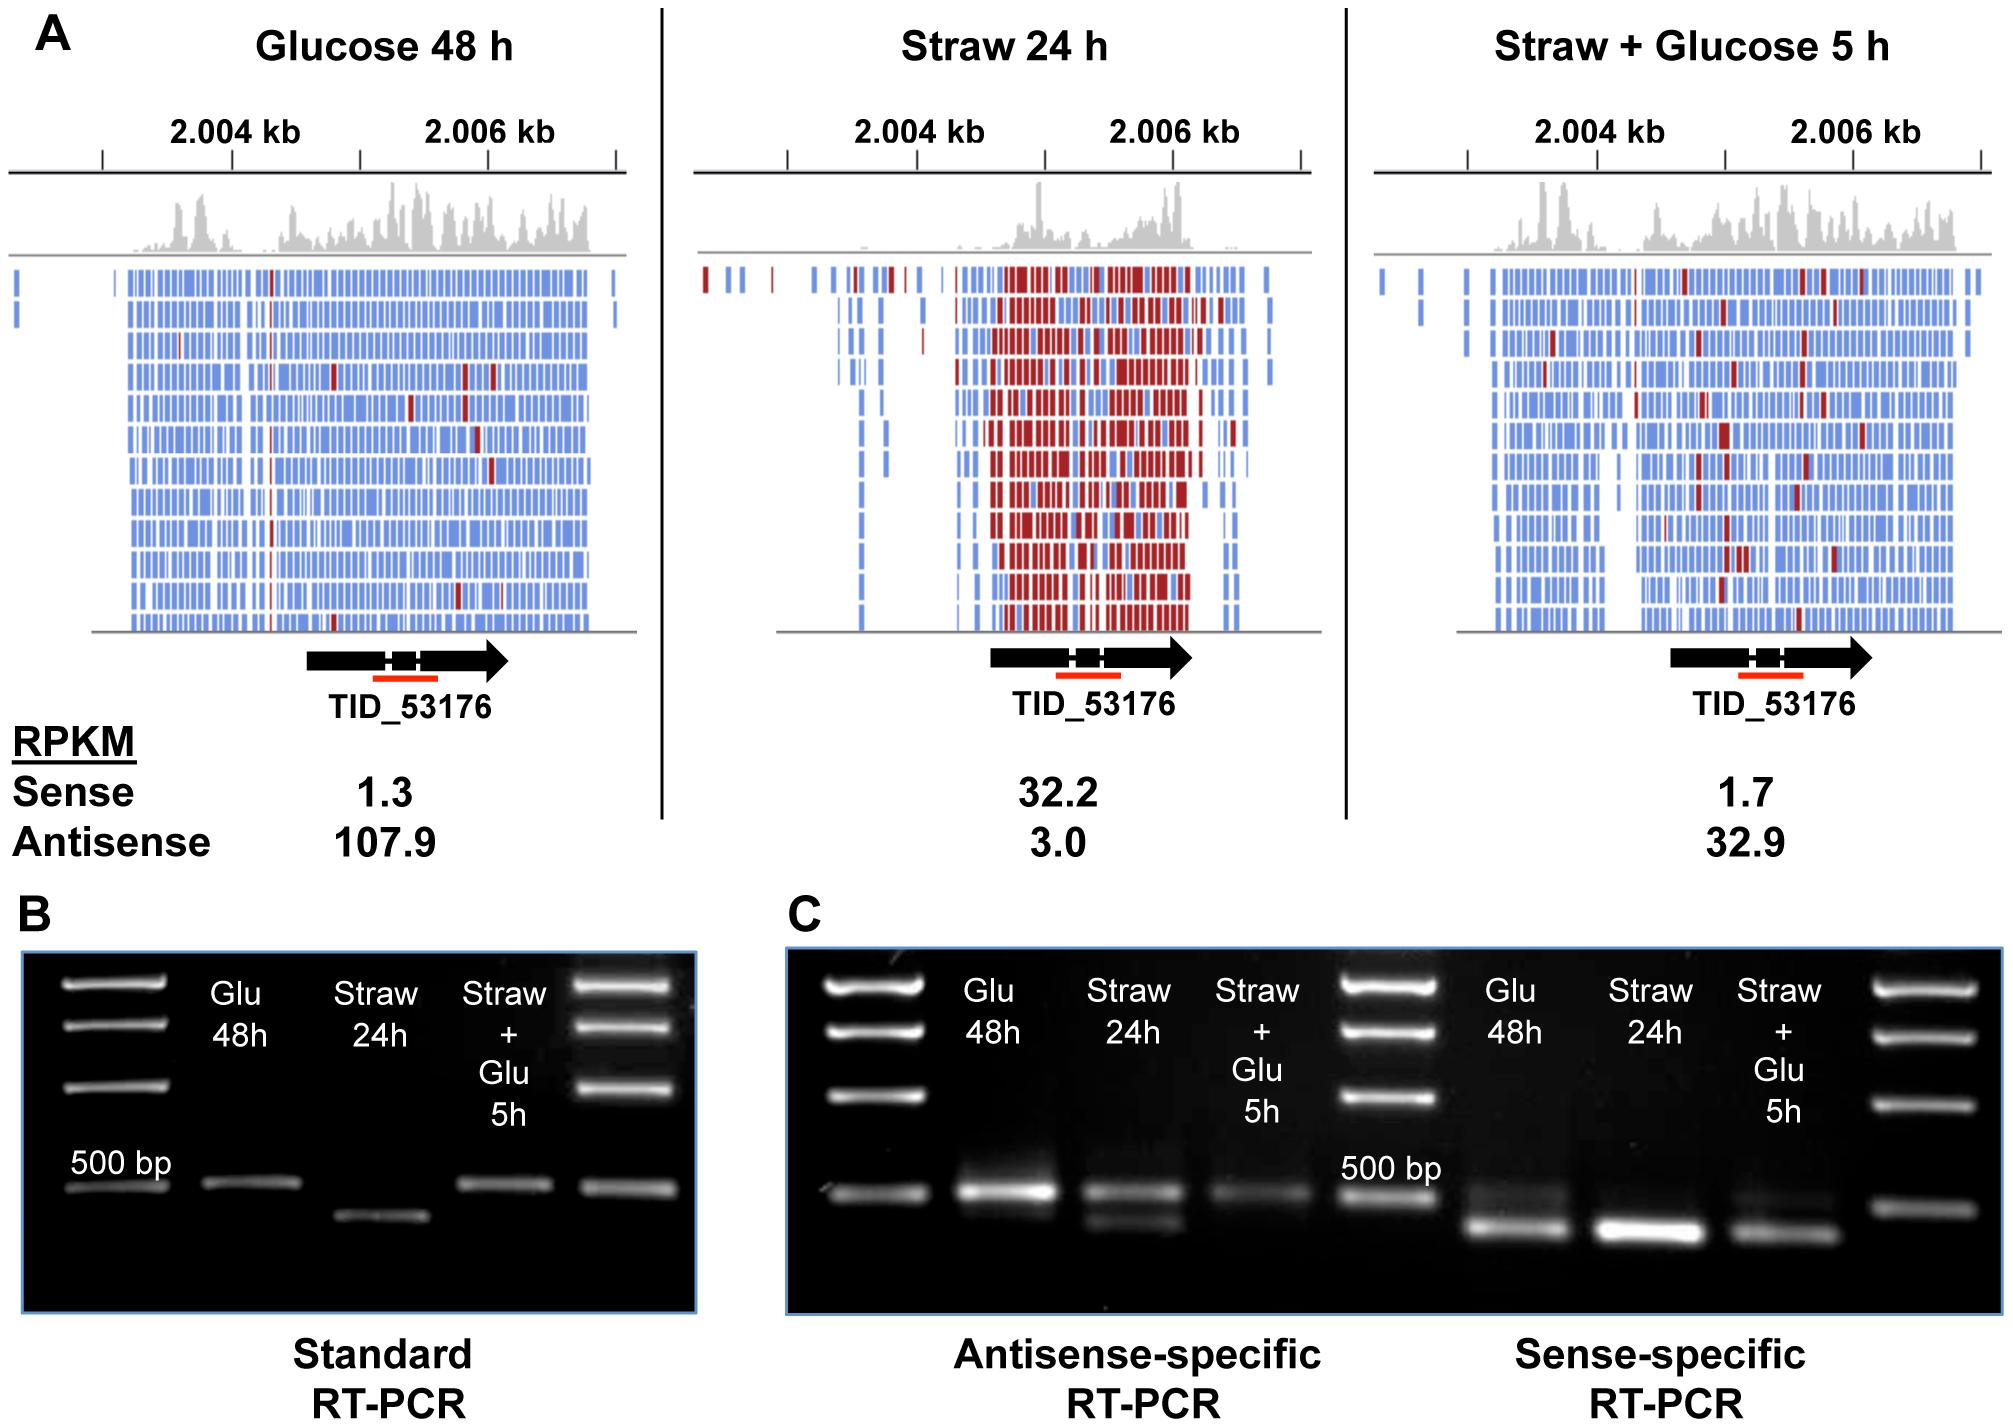 Sense and antisense transcription from TID_53176.